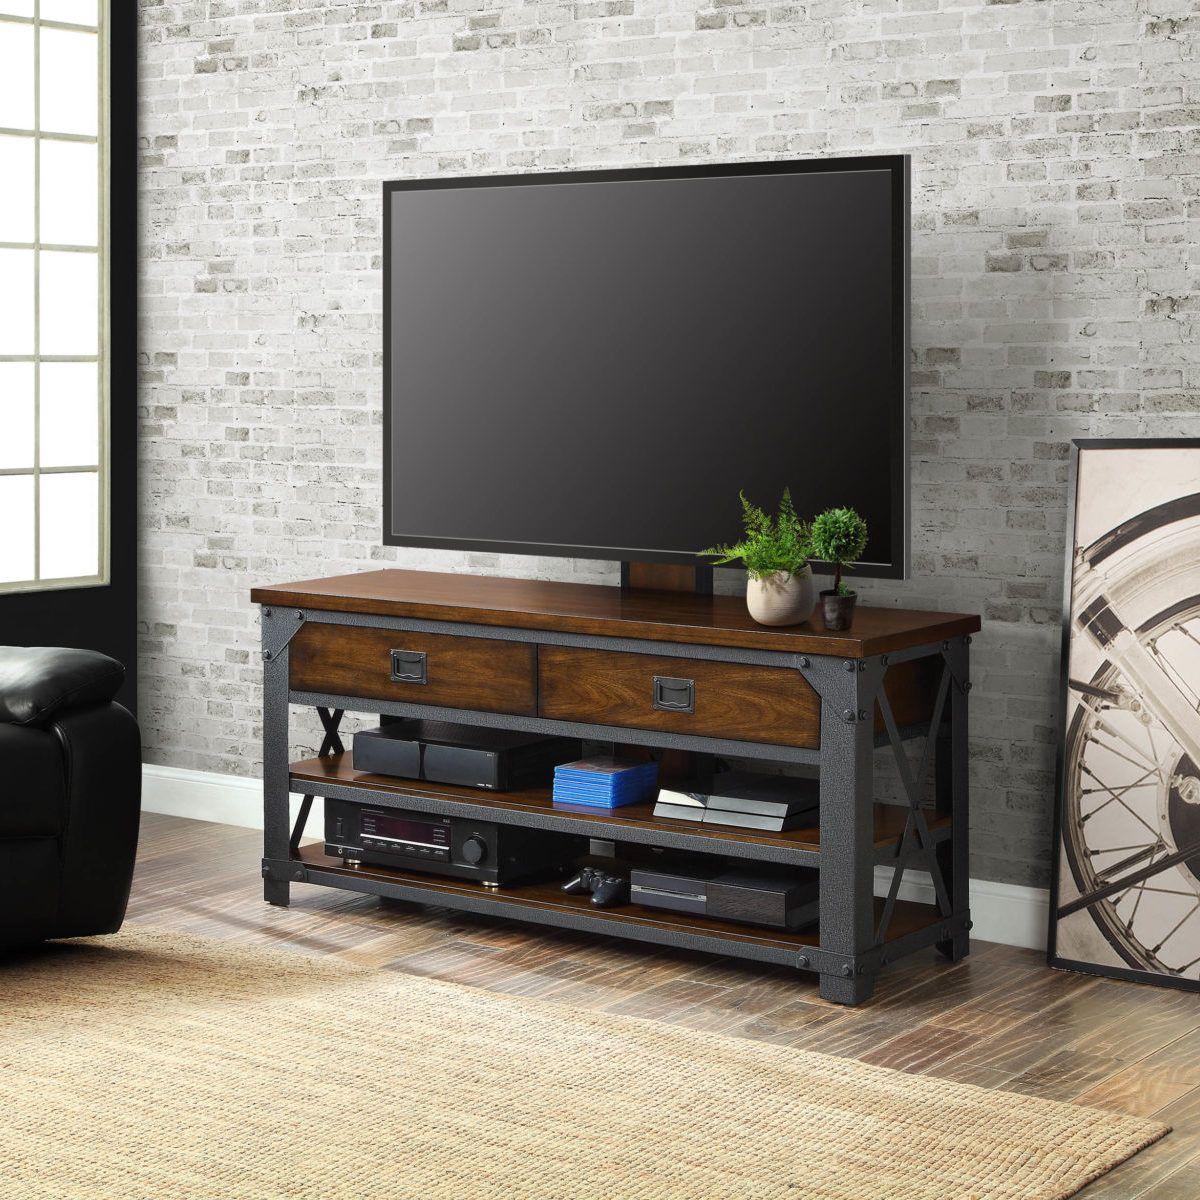 Bayside Furnishings In 2020 Bayside Furnishings Tv Stand Metal And Wood Furnishings